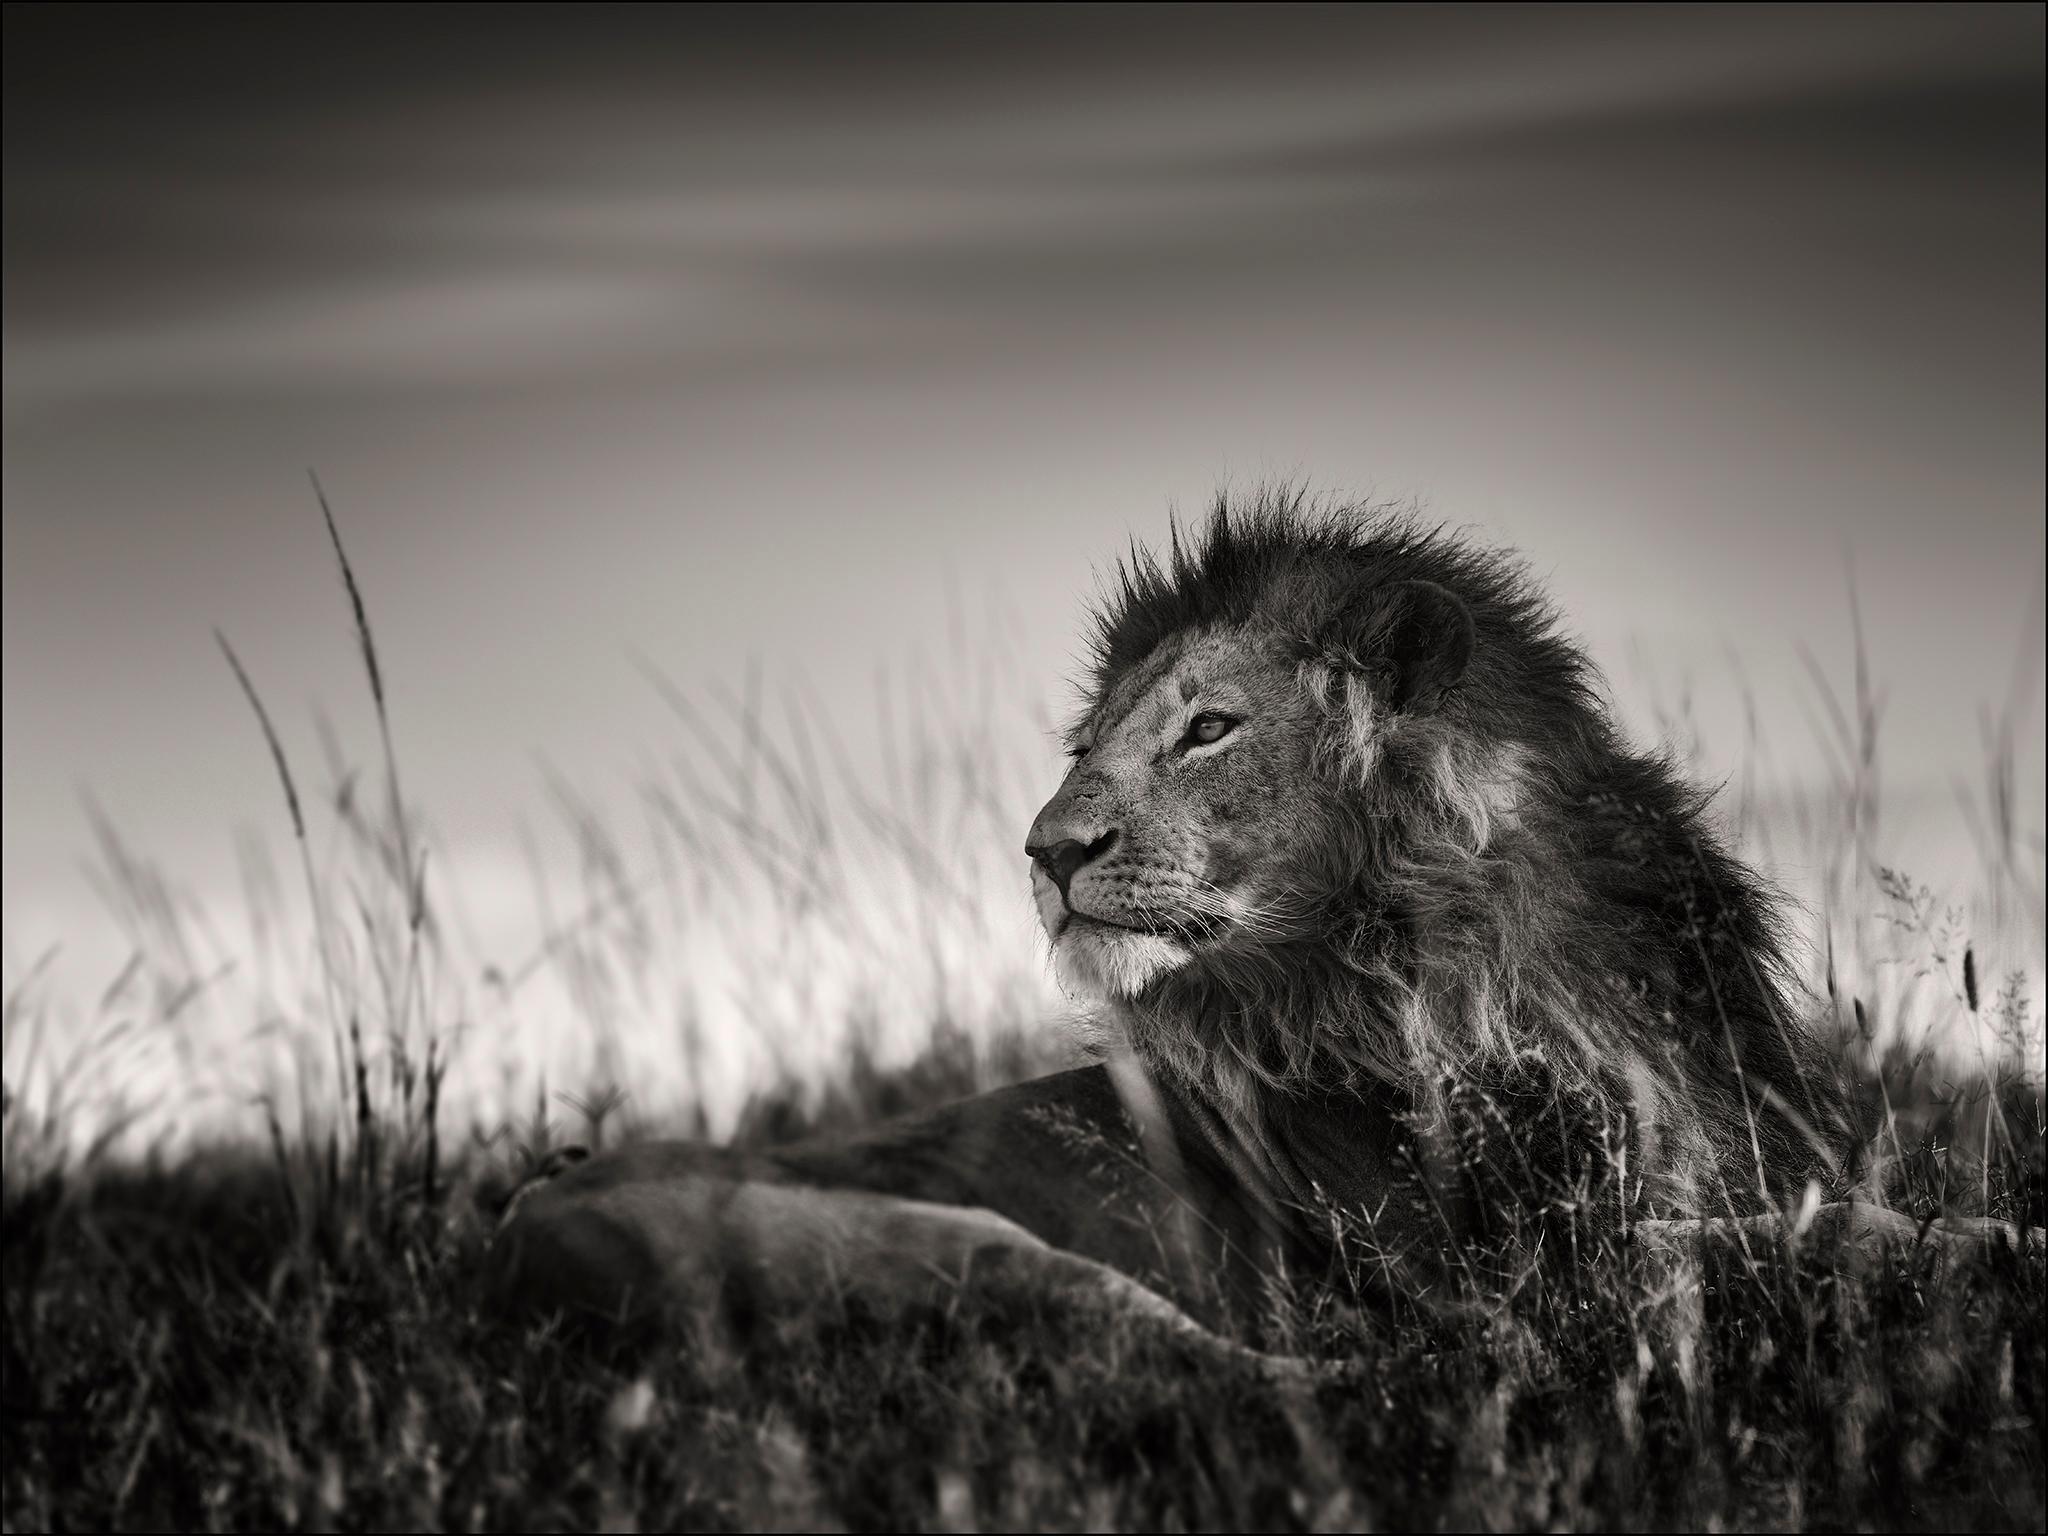 Lion Portrait II, blackandhwite photography, Africa, Portrait, Wildlife